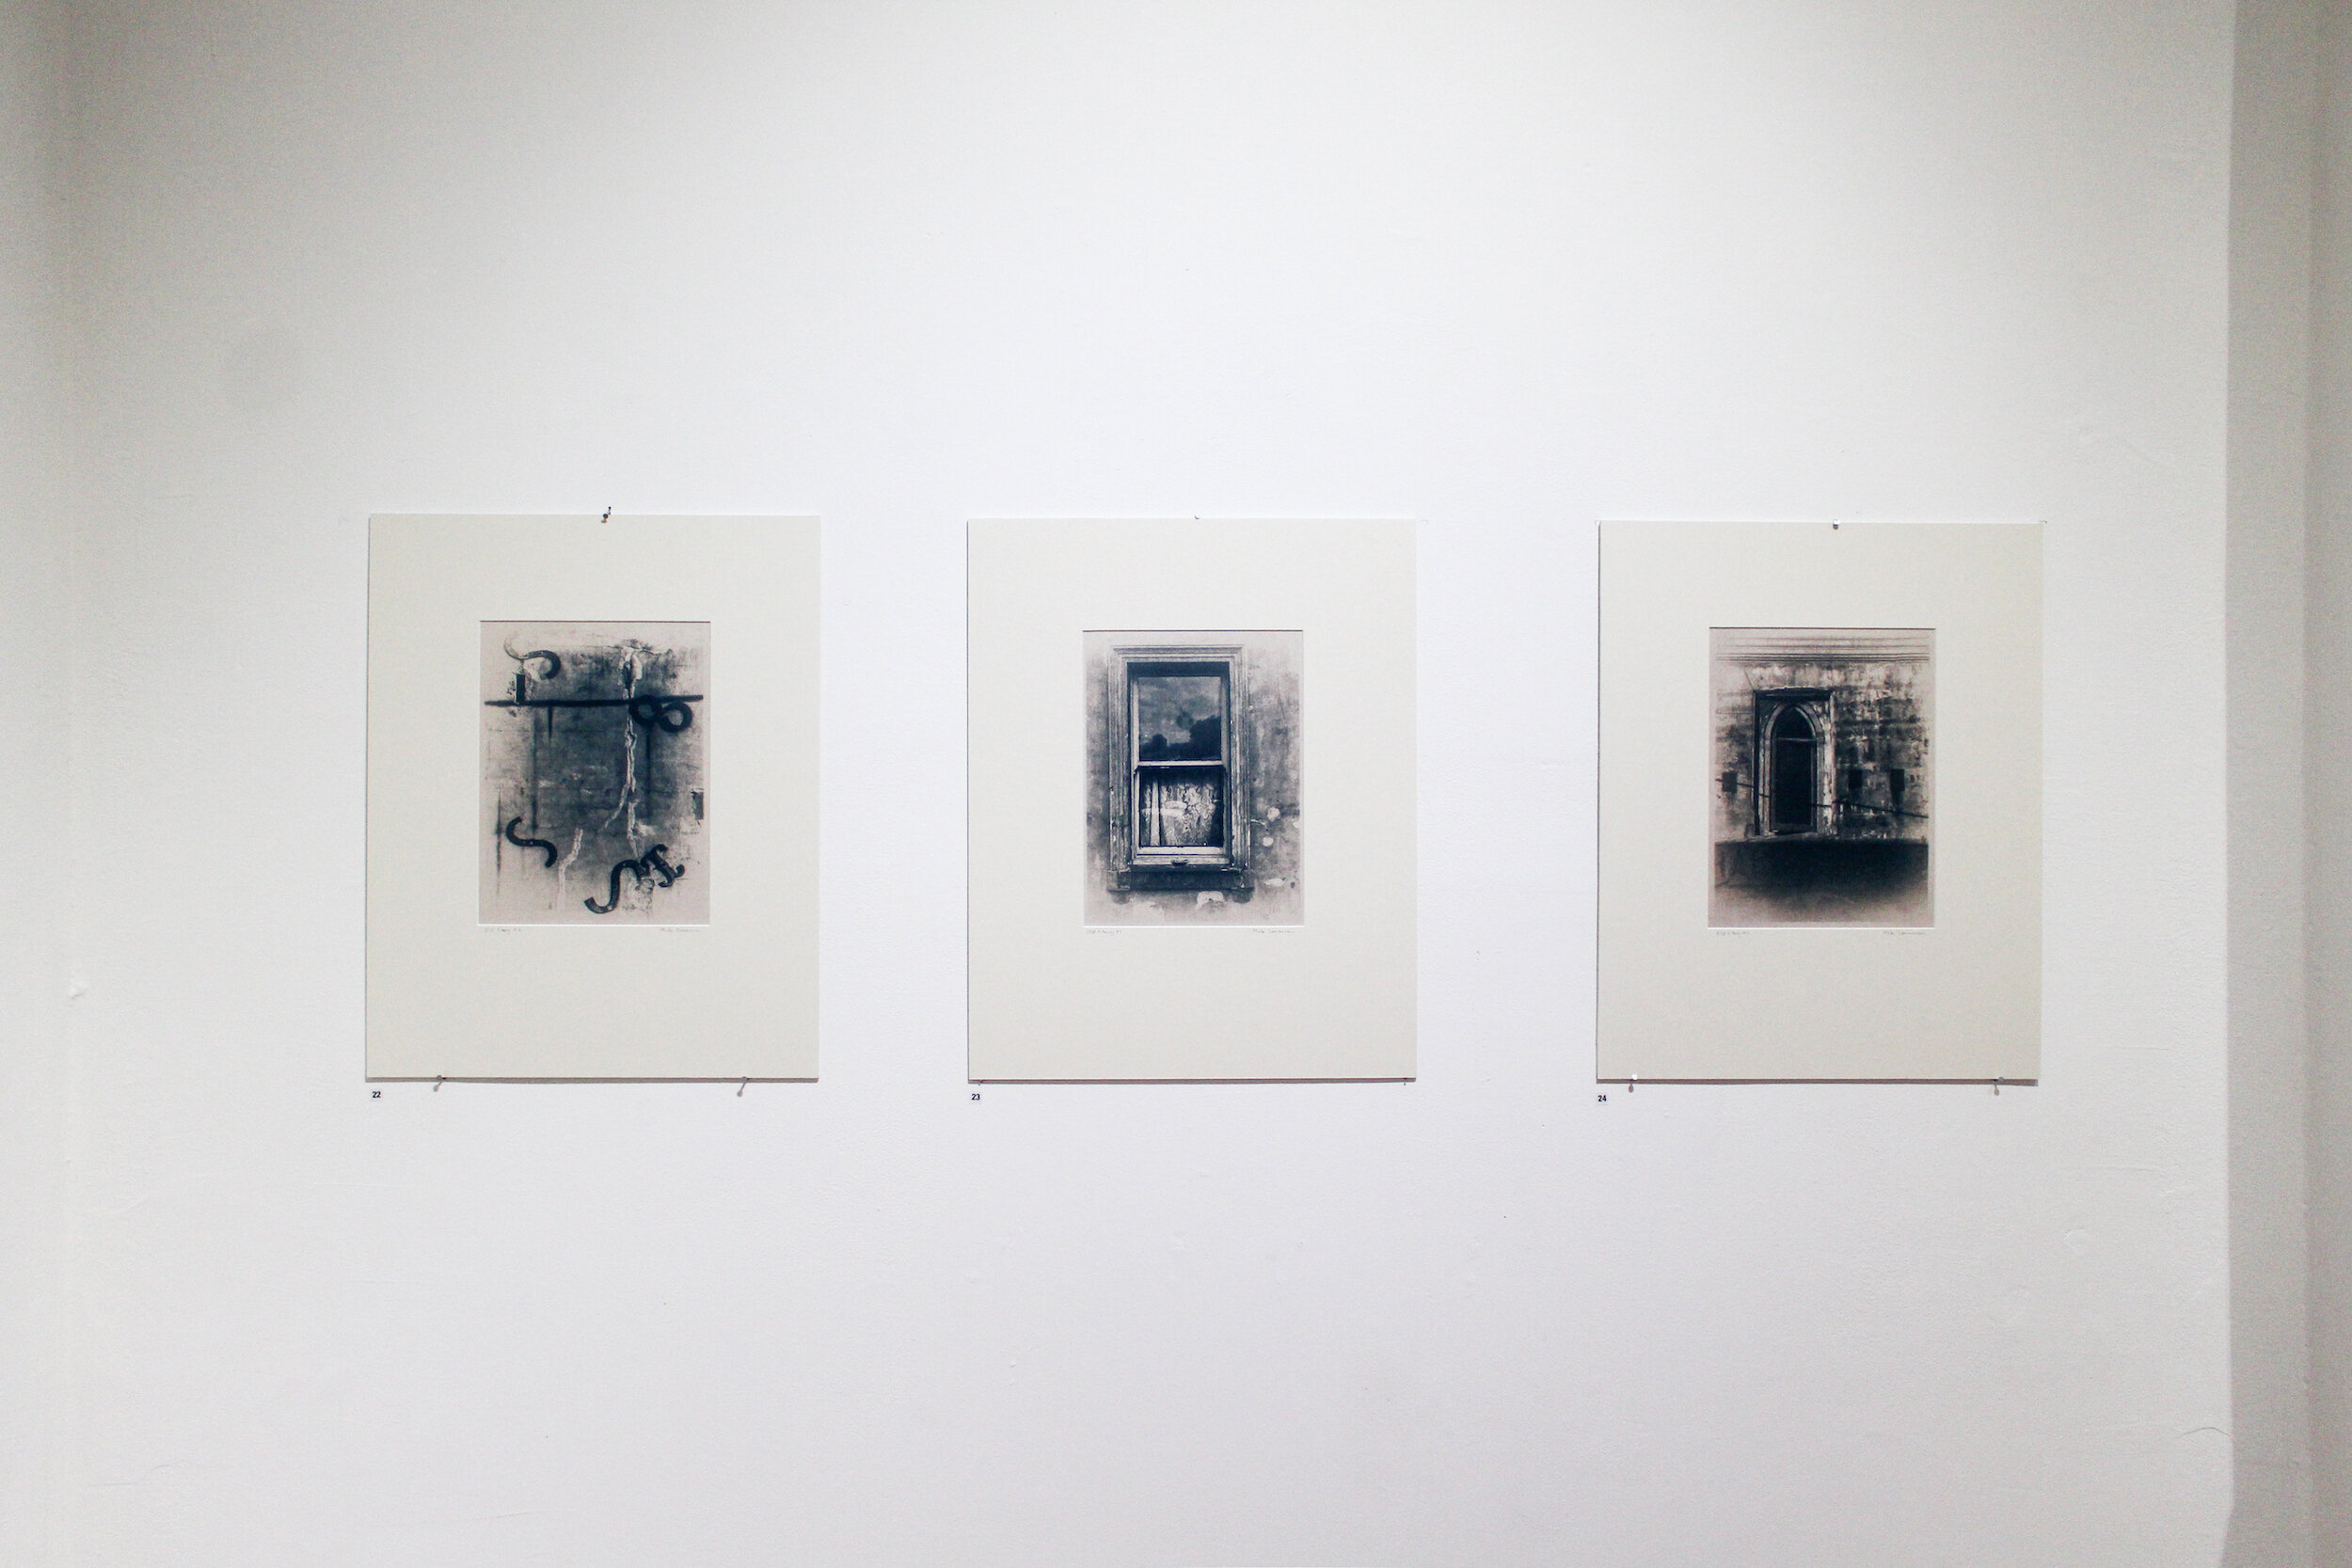 Mark Lourensz,  Old Fitzroy #1 , cyanotype on rice paper, 21 x 29cm,  Old Fitzroy #2 , cyanotype on rice paper, 21 x 29cm,  Old Fitzroy #3 , cyanotype on rice paper, 21 x 29cm